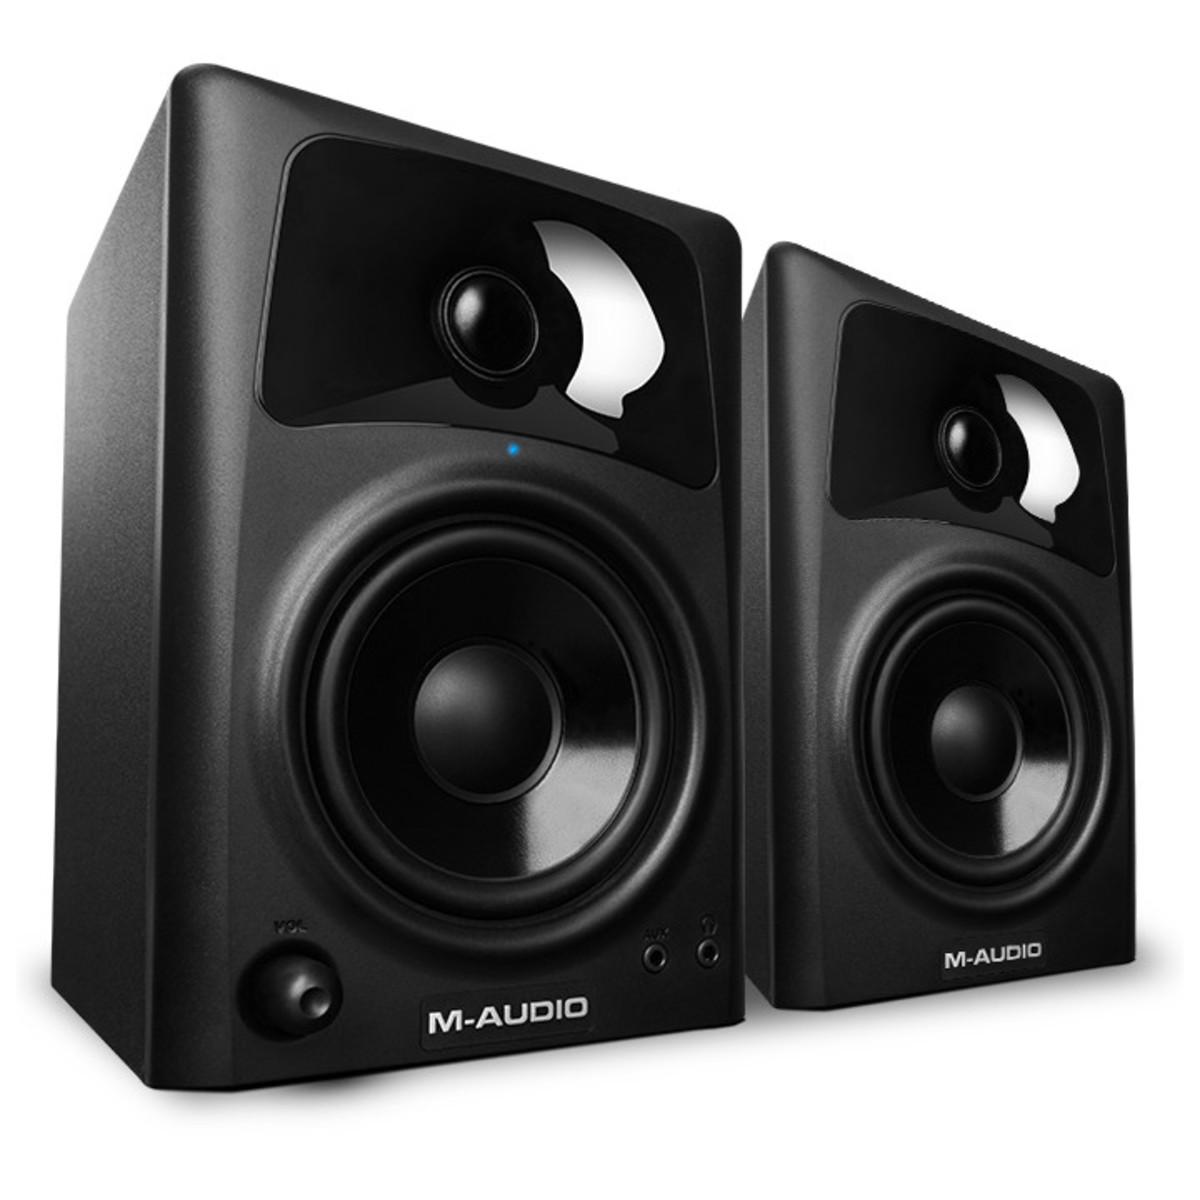 M-Audio AV42 Active Desktop Monitor Speakers, Pair